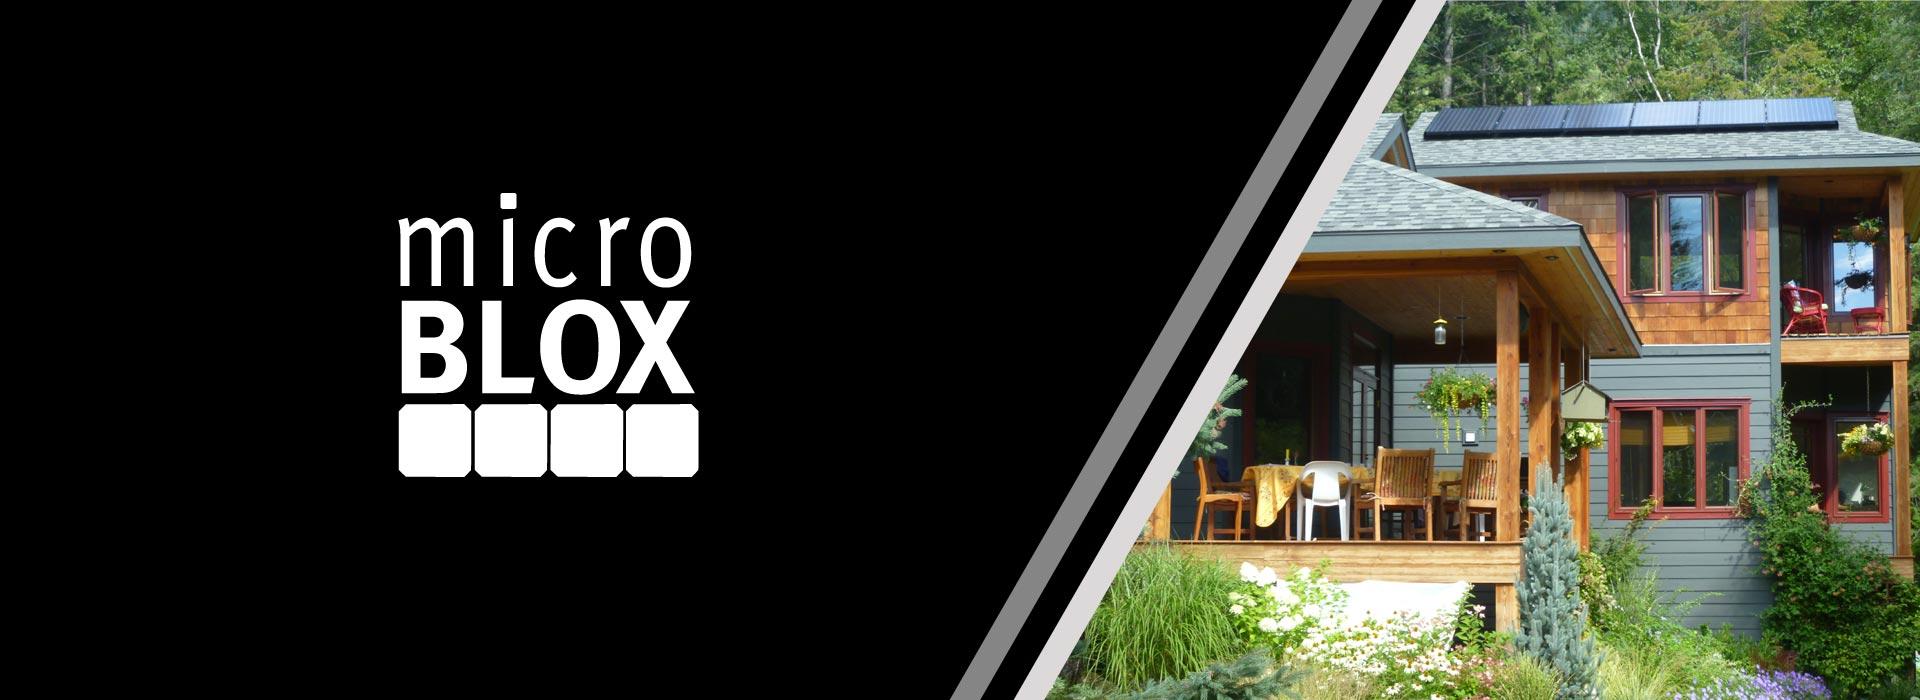 MicroBlox